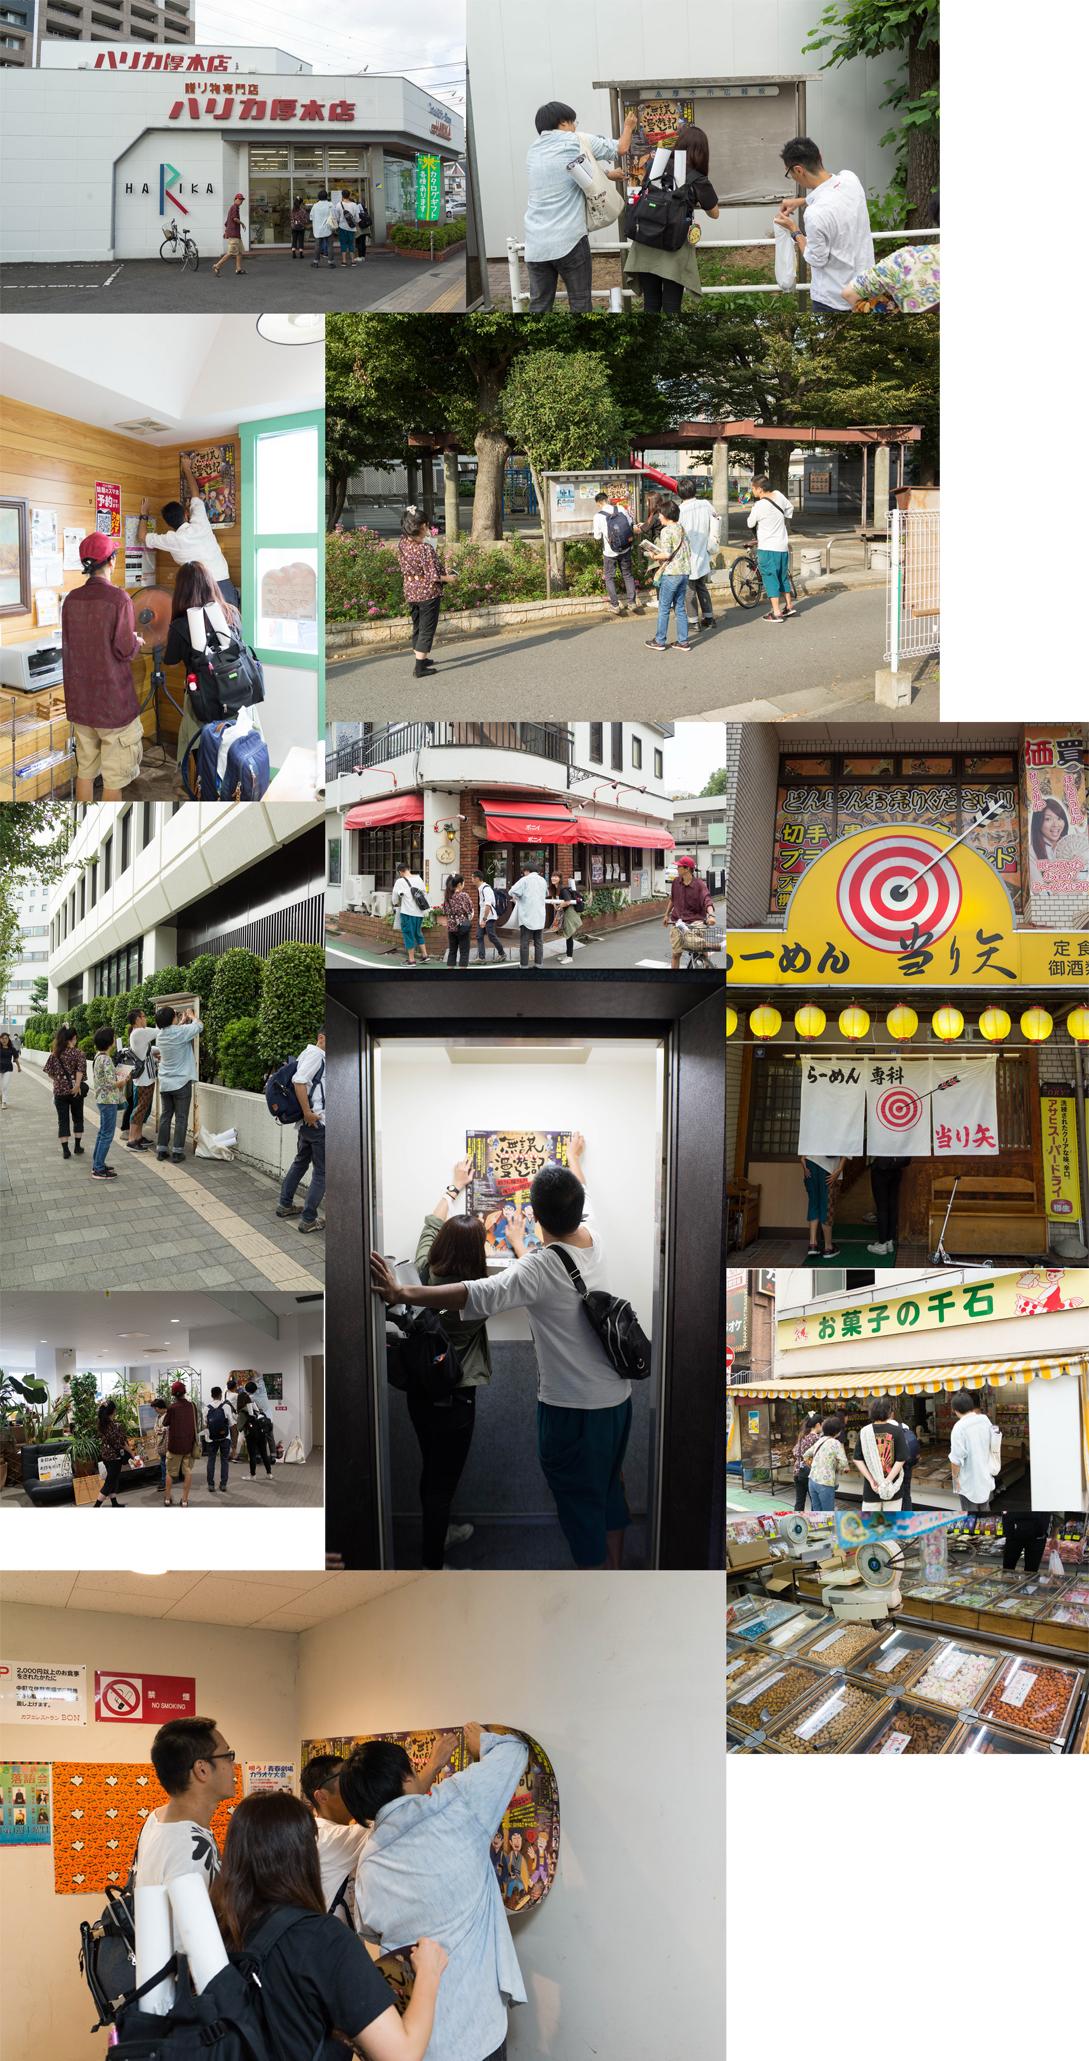 http://www.gobumori.com/picture/atsugi.jpg